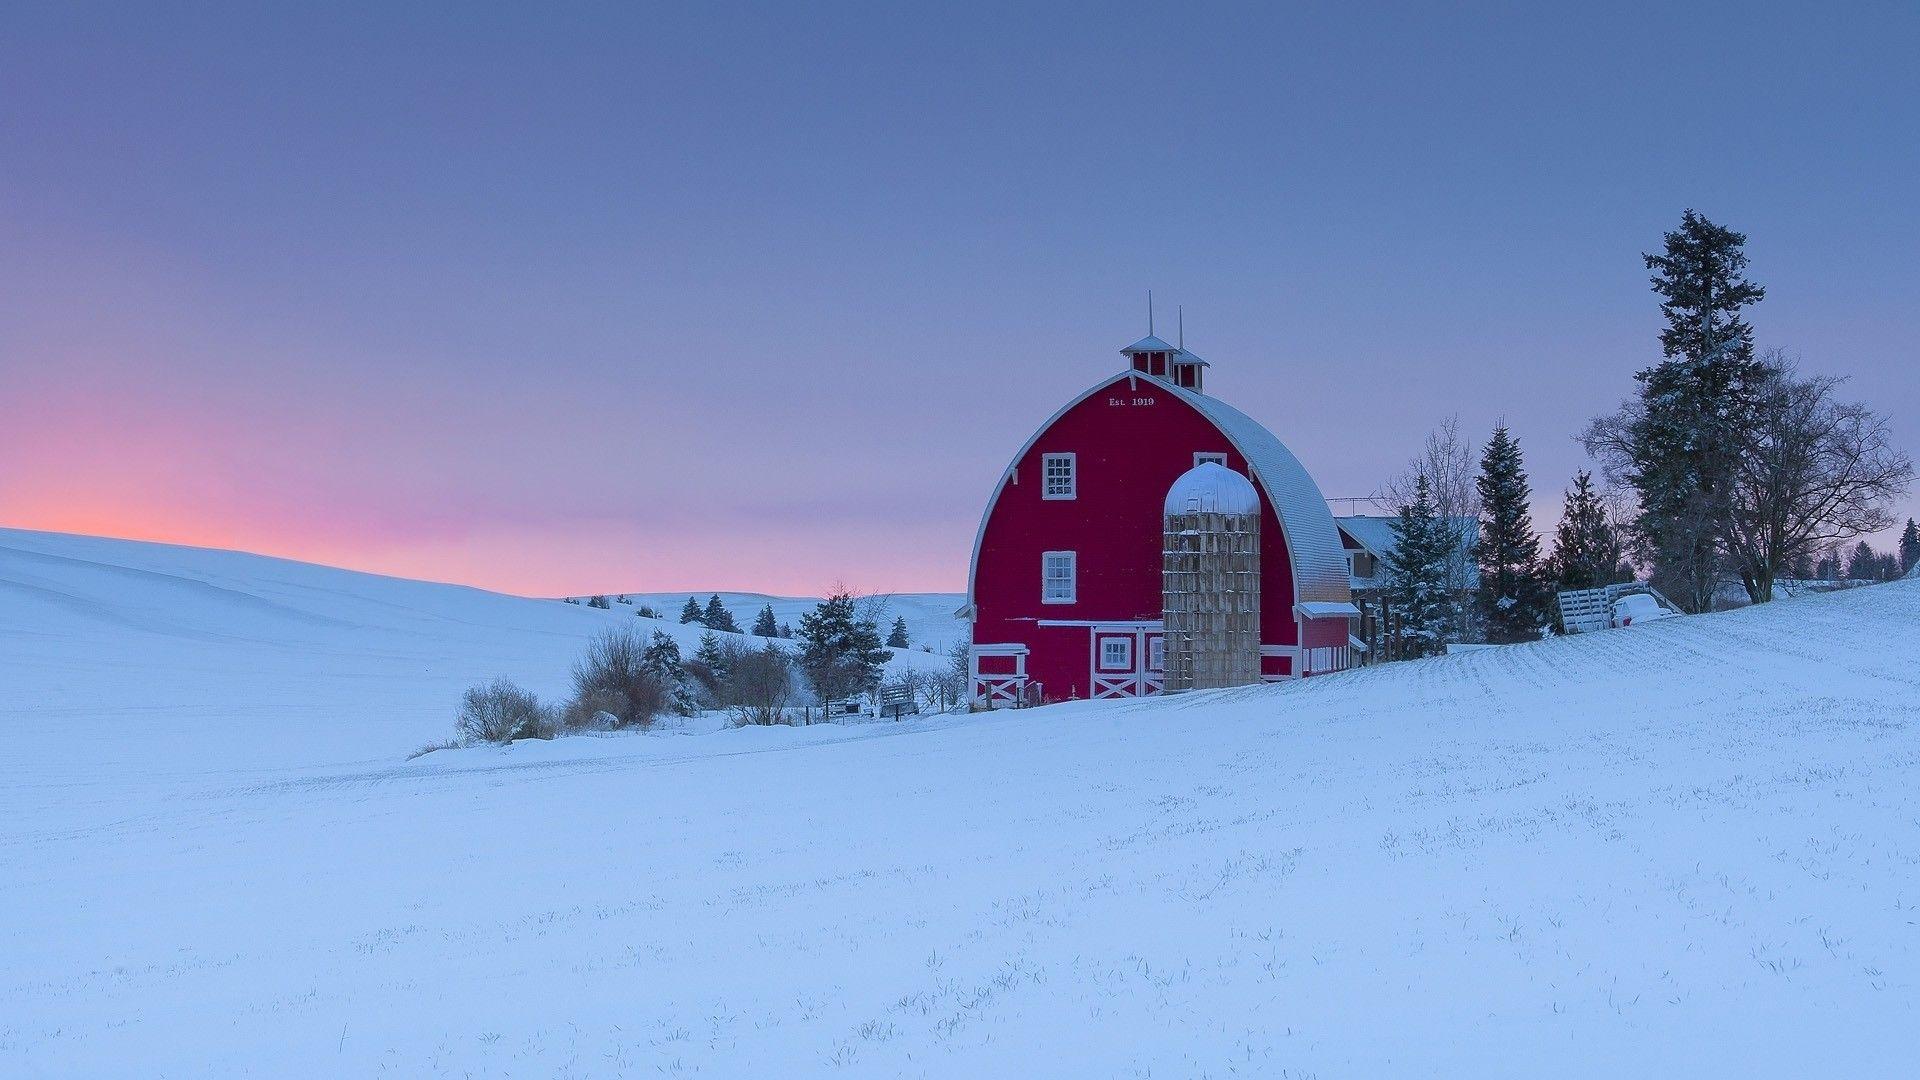 Red Barn Silo Winter Sunset Season Washington Region Art